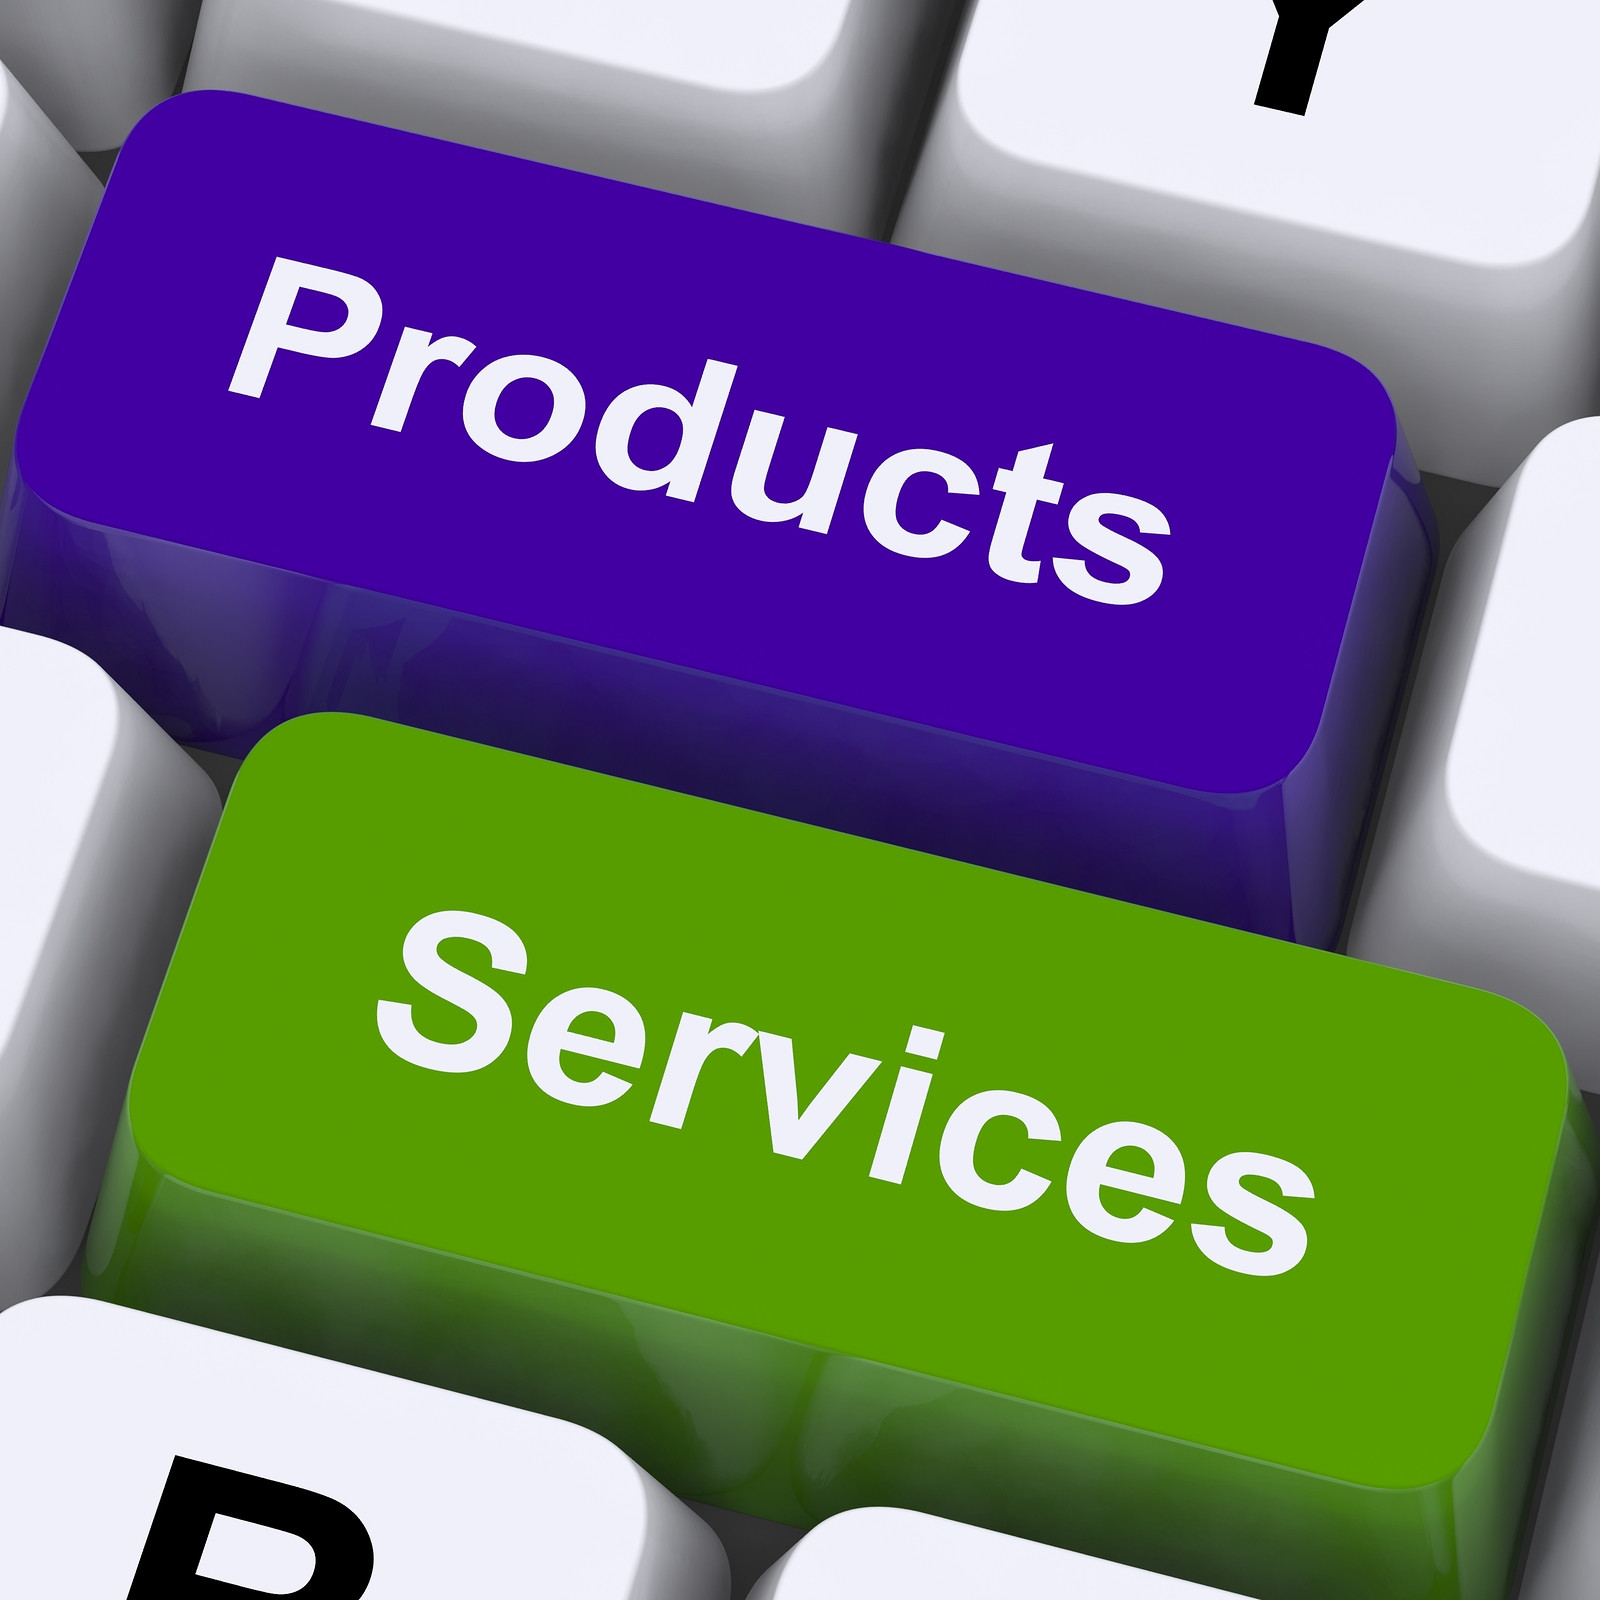 Product Distribution & Marketing